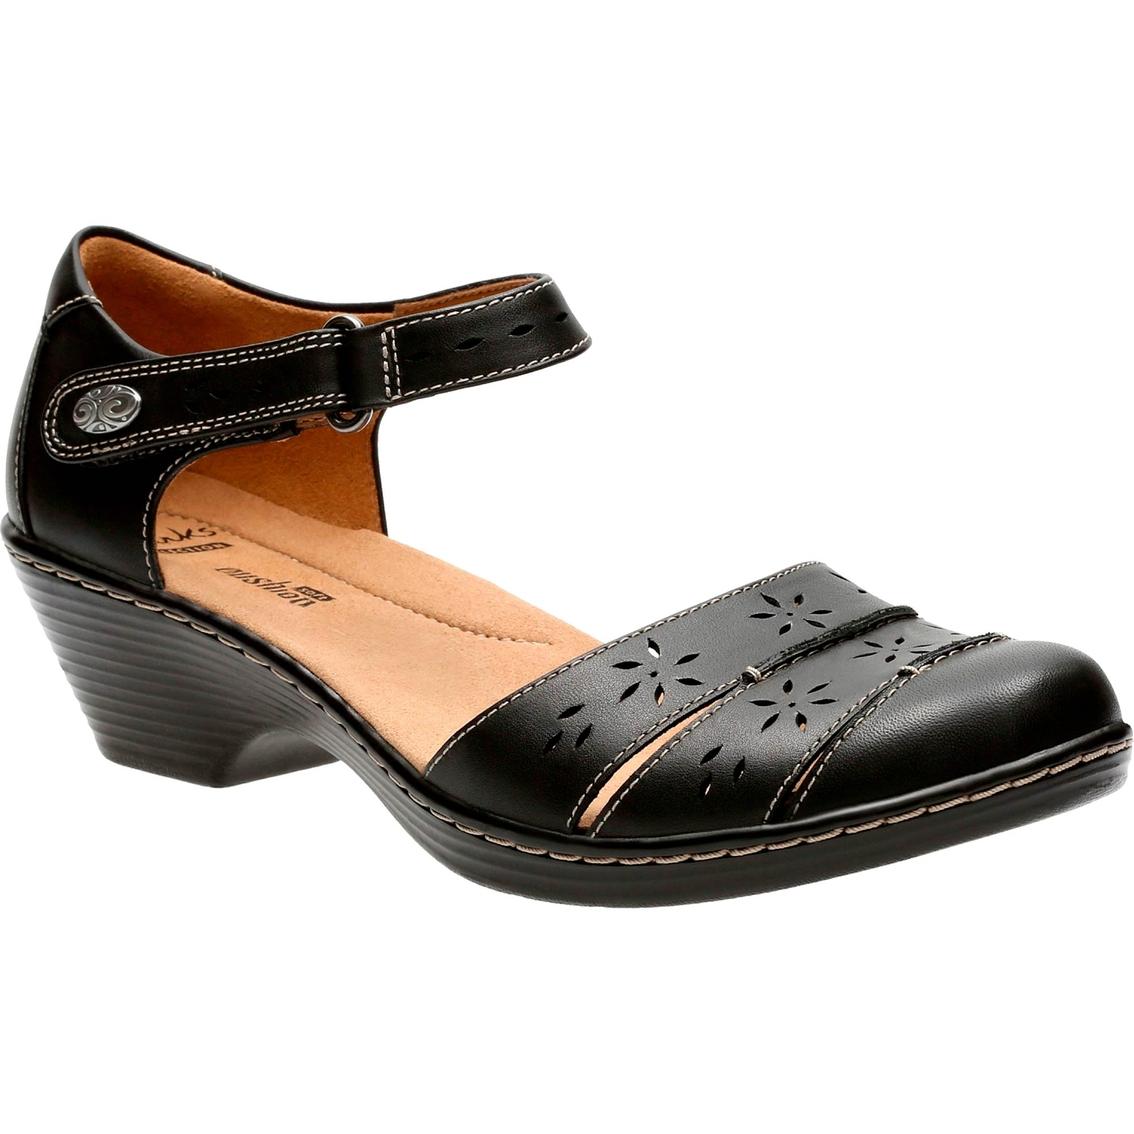 4ca9aaee94c15 Clarks Wendy Leehi Close Toe Instep Strap Sandals